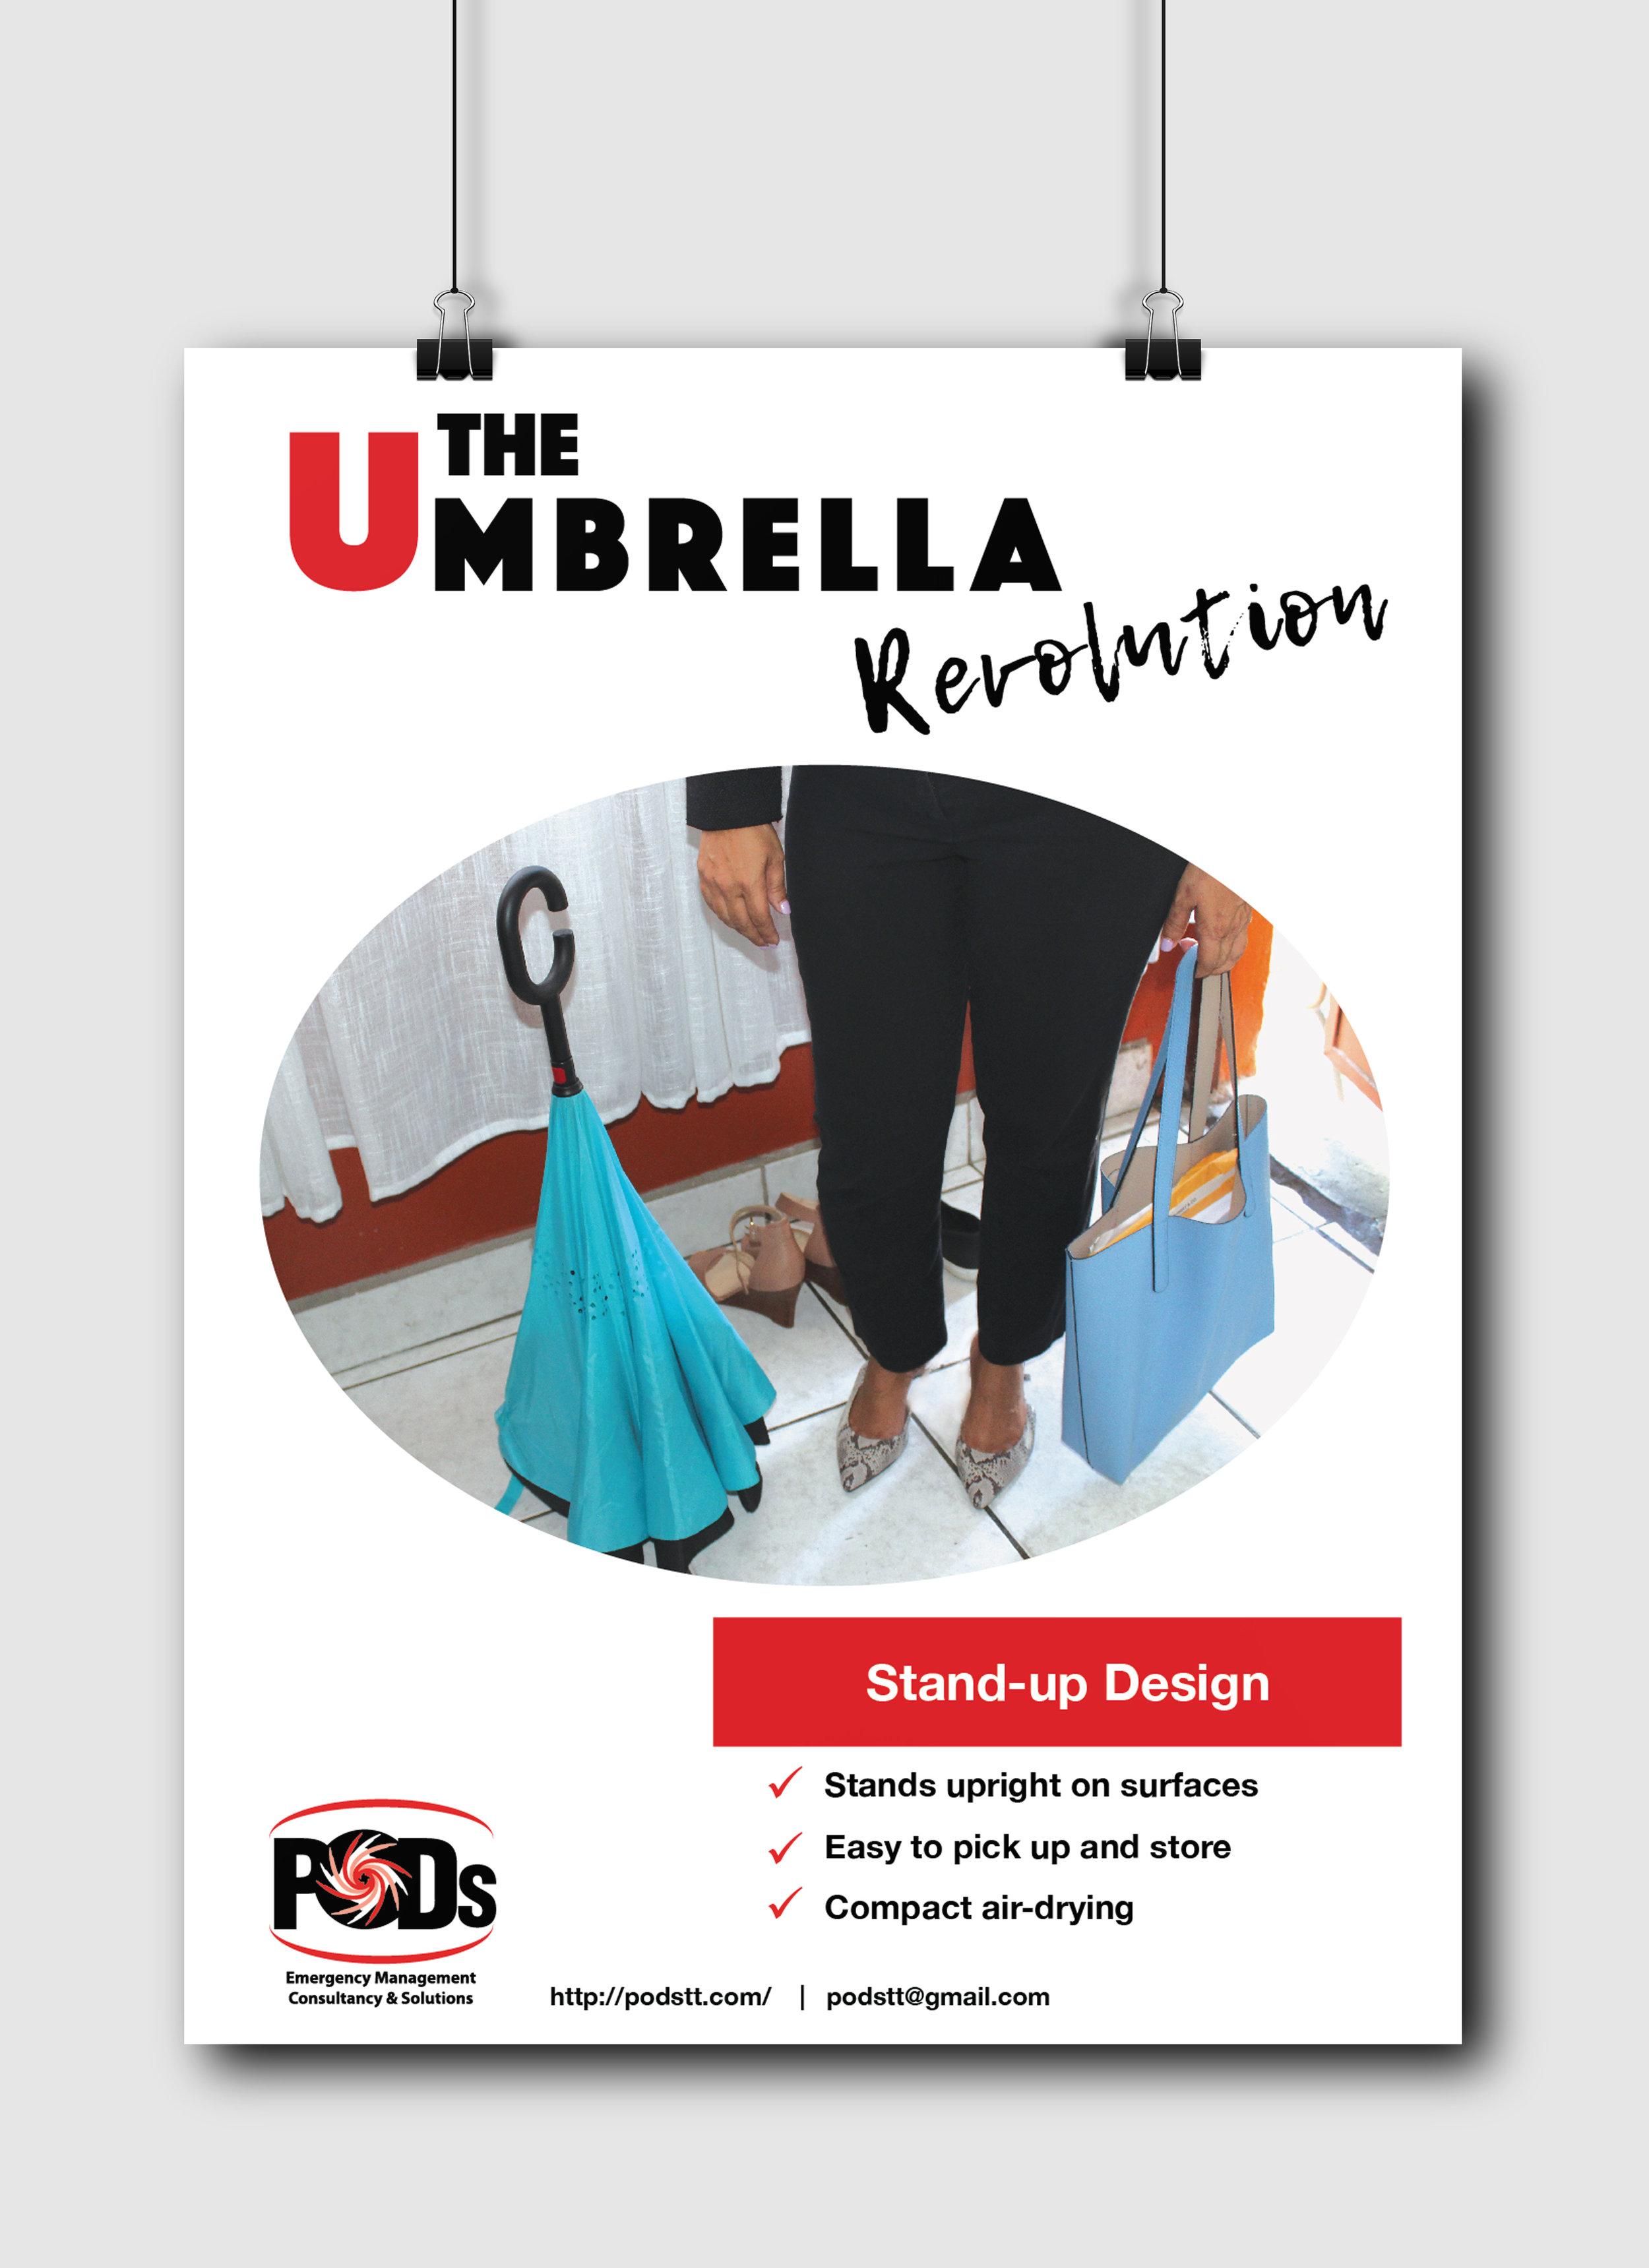 UmbrellaPods_3.jpg